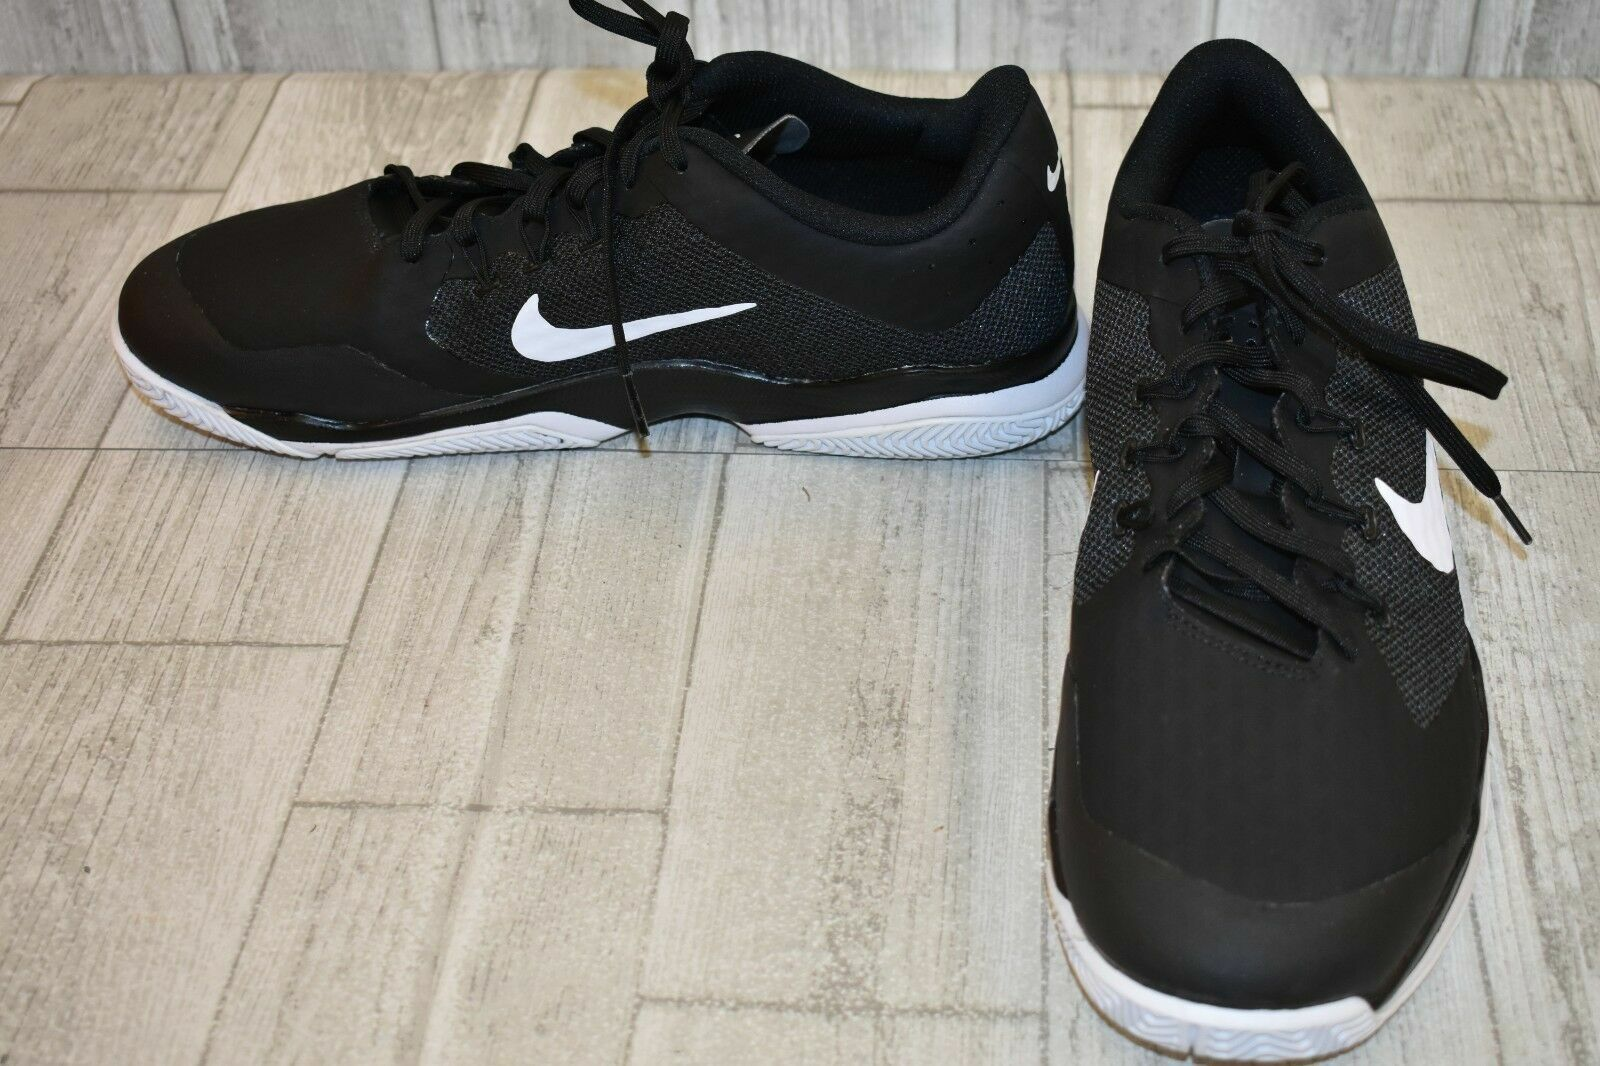 Tr Training Fingertrap Wide Men's Nike Lunar 4e White Shoes Size 11 Black vmN8n0wO